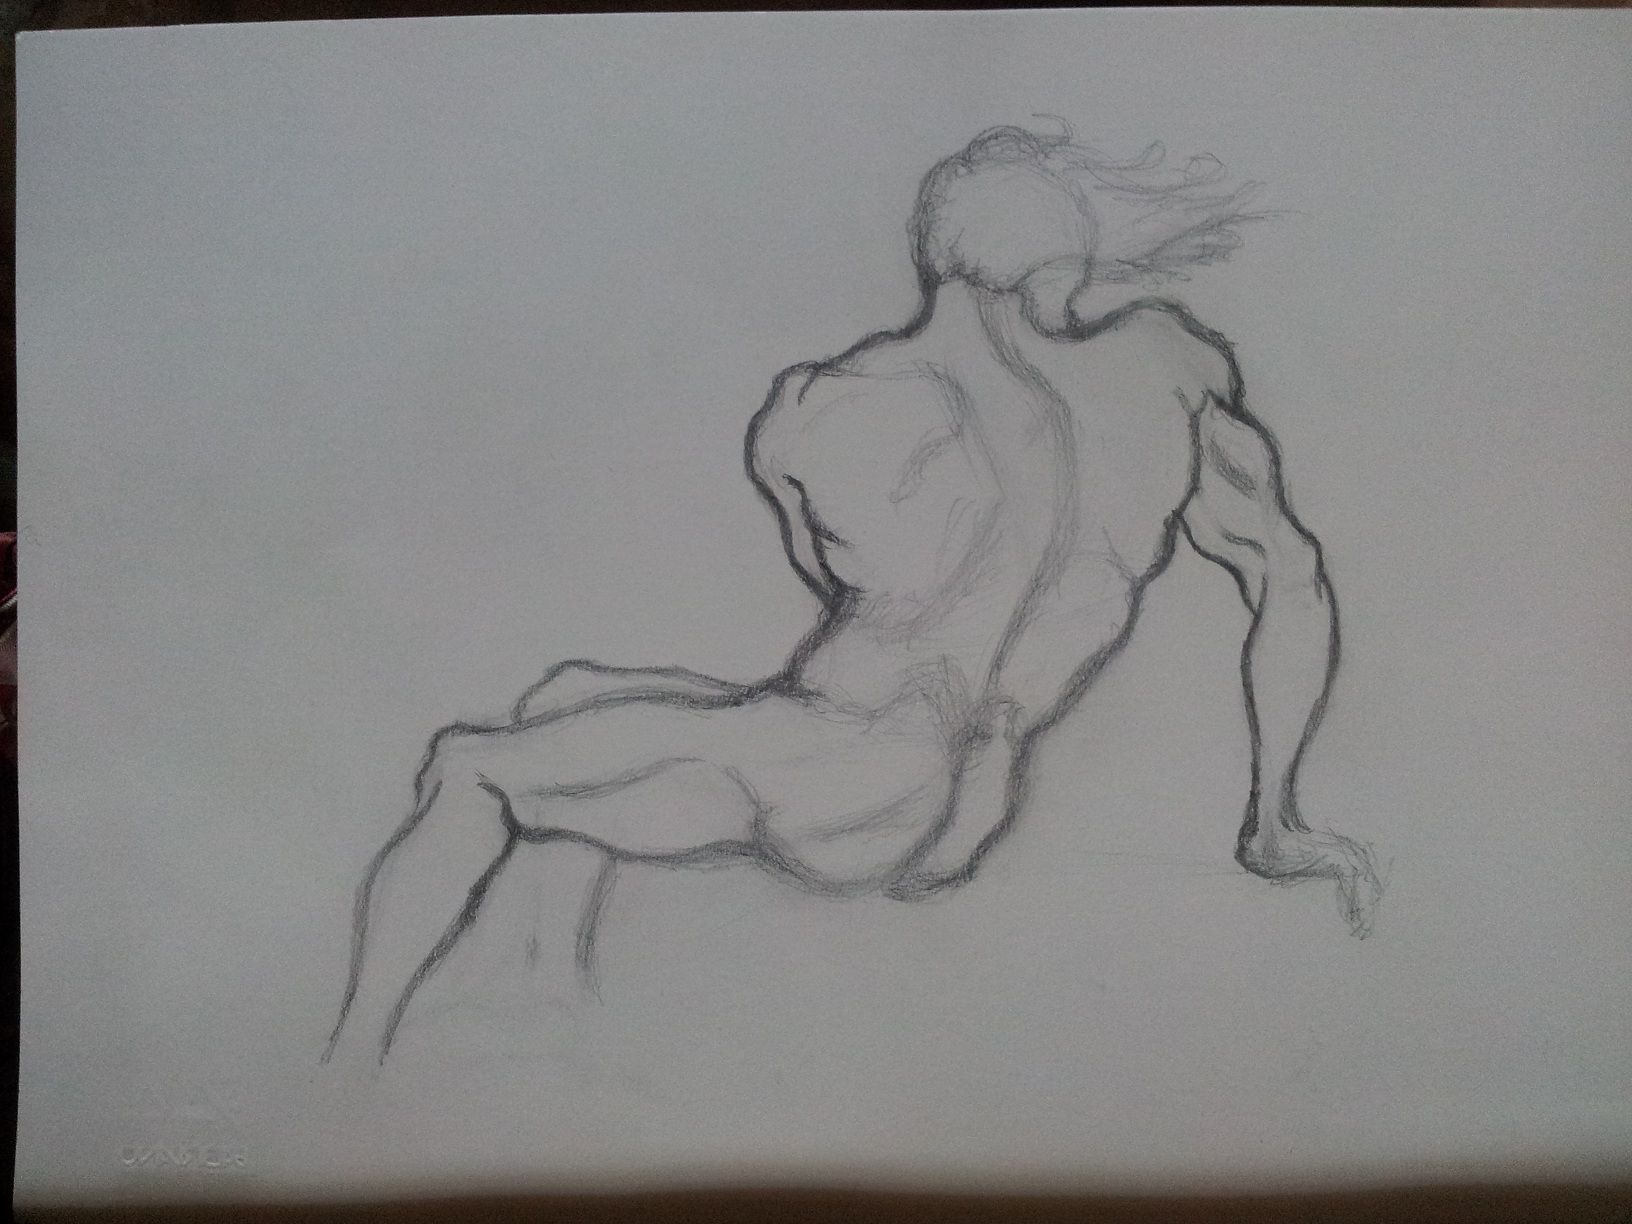 Back Anatomy study - Quick sketch by Dex91